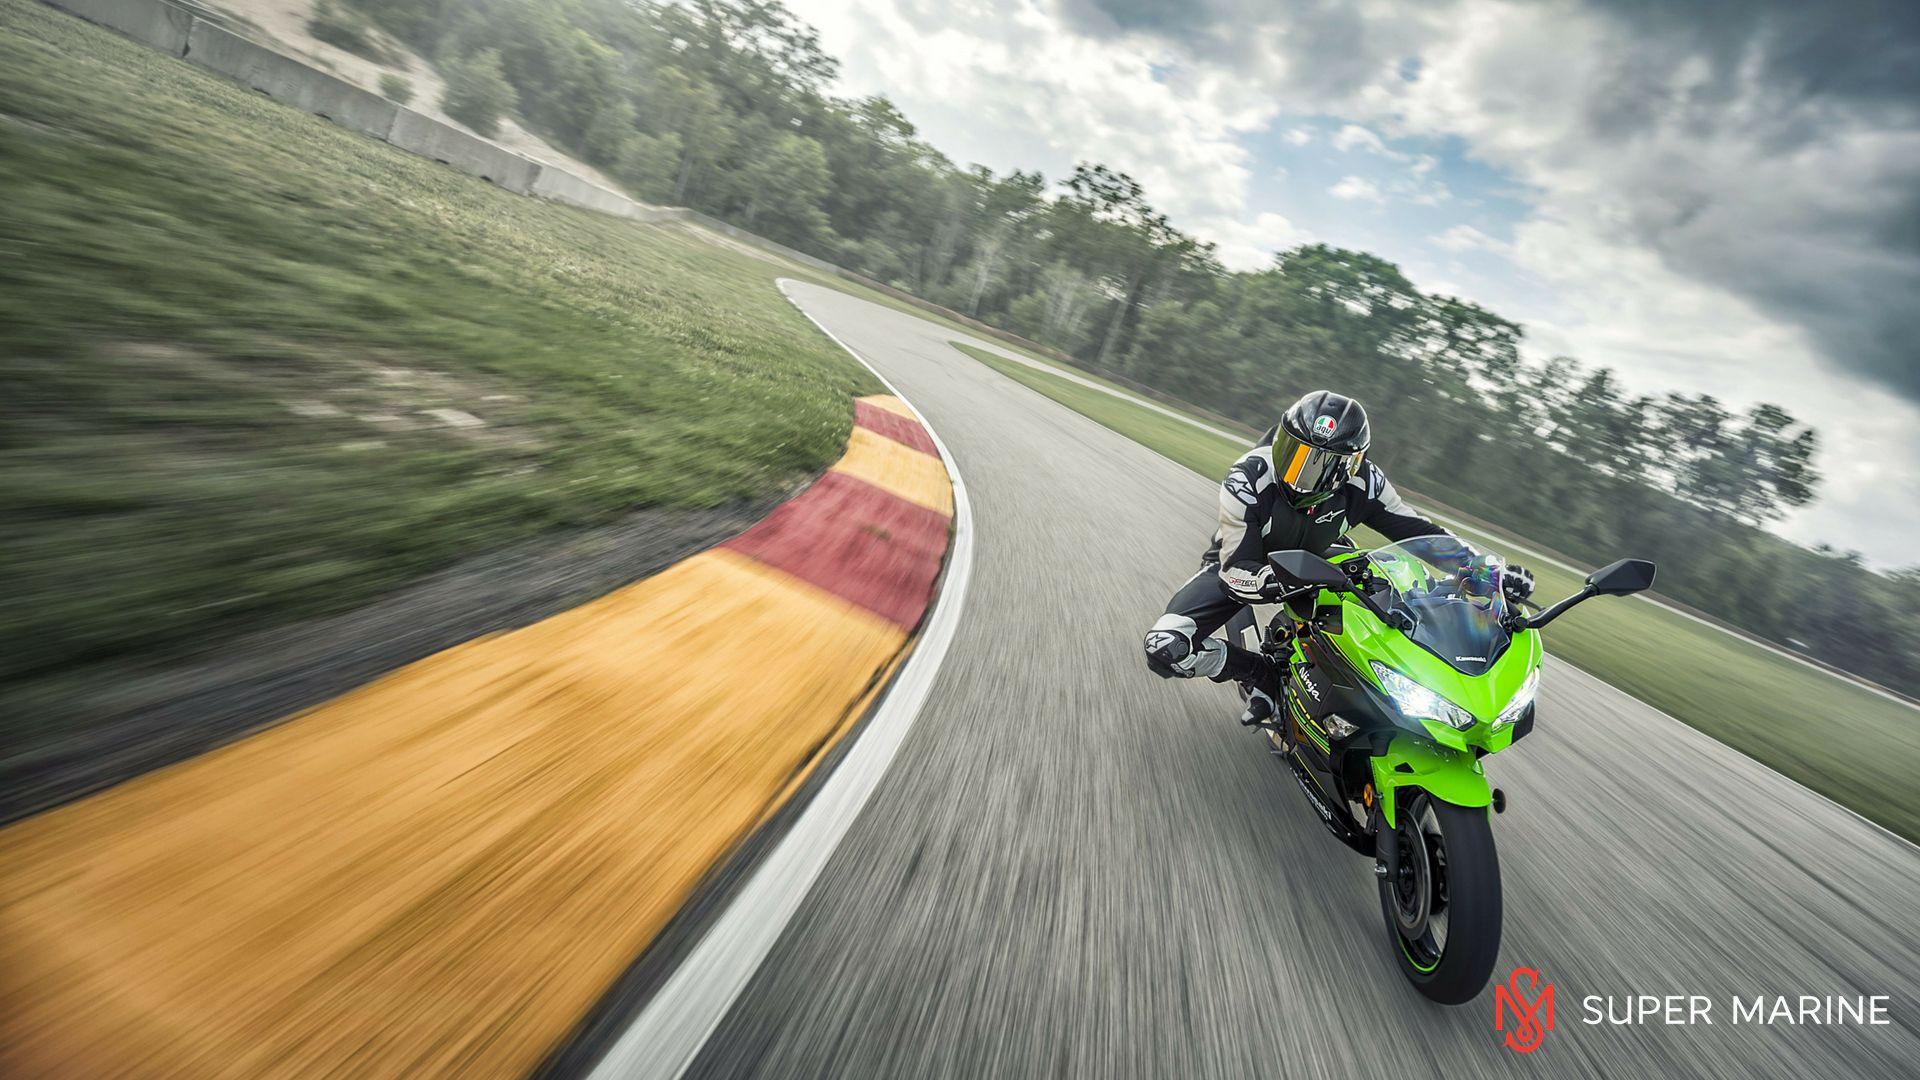 Мотоцикл Kawasaki Ninja 400 Зеленый 2020 - 9